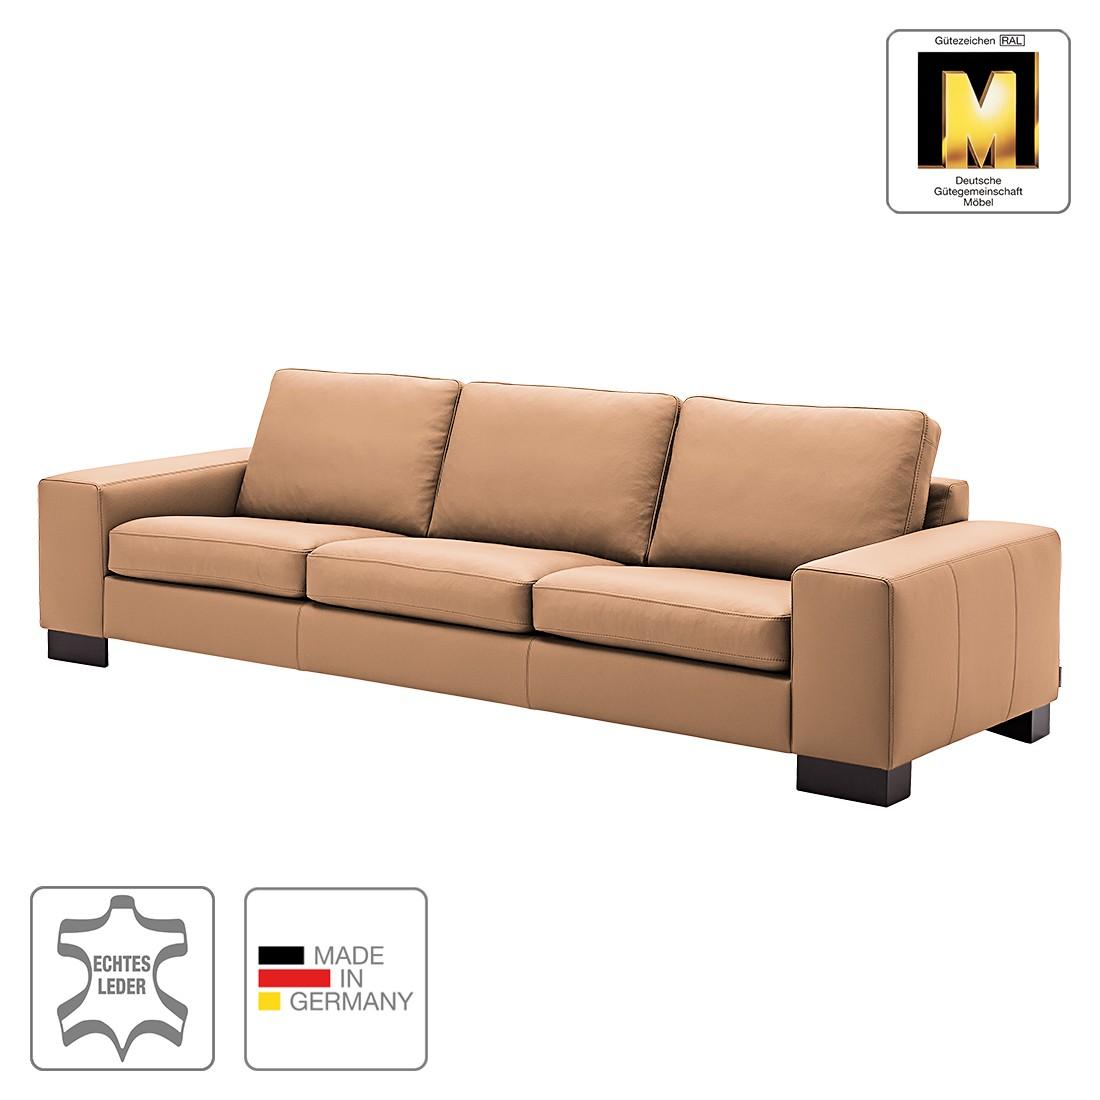 Sofa Matador (4-Sitzer) - Echtleder - Taupe - 1 Kissen, Machalke Polsterwerkstätten